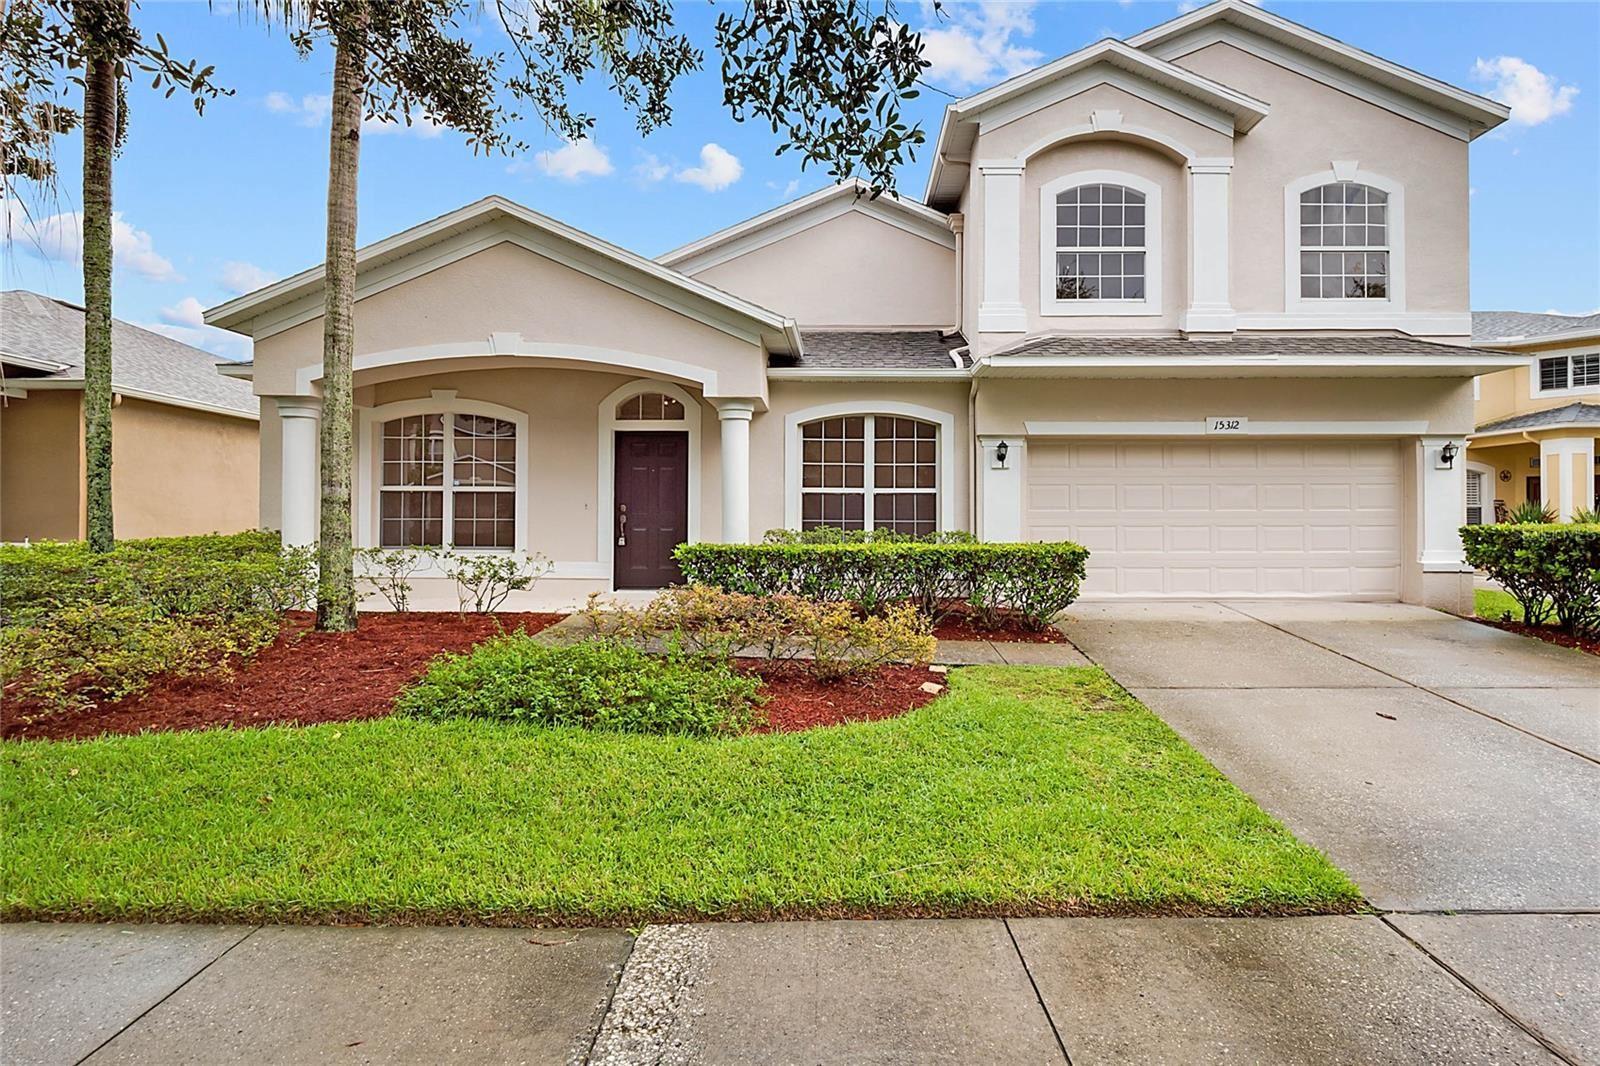 15312 PEBBLE RIDGE STREET, Winter Garden, FL 34787 - #: O5970364